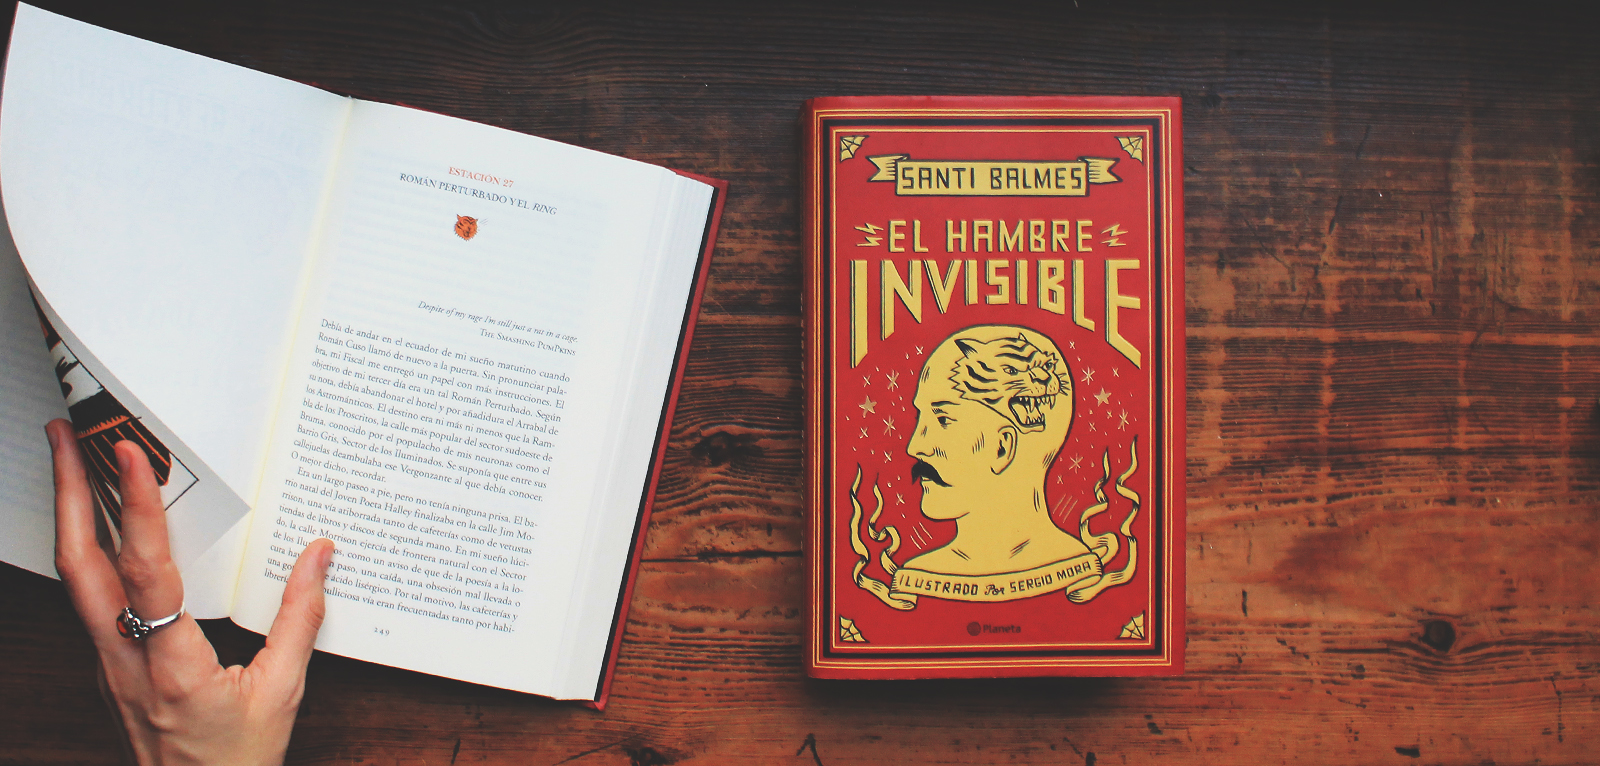 El Hambre Invisible · Santi Balmes